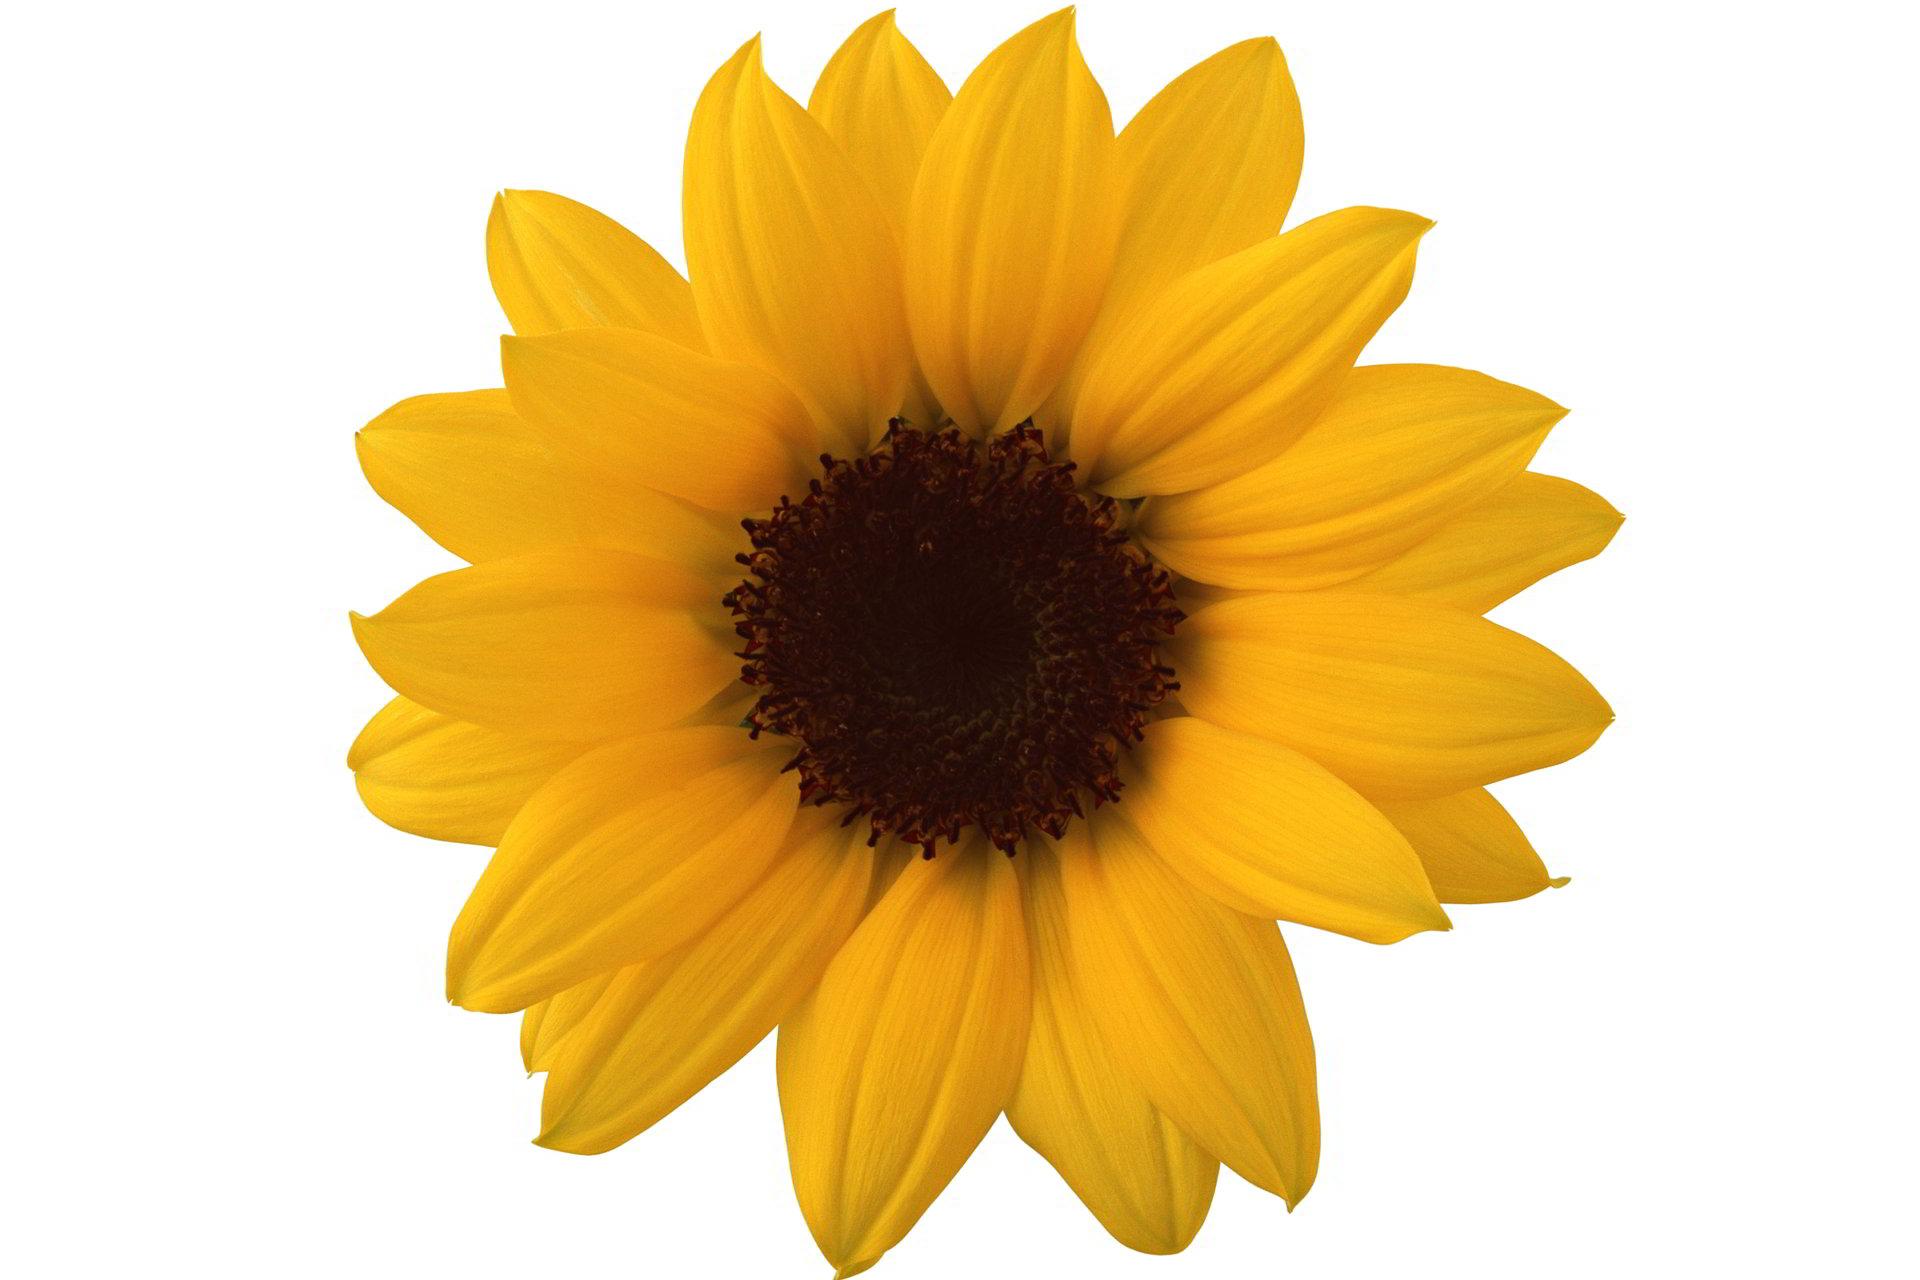 hinh anh hoa cuc dep 44